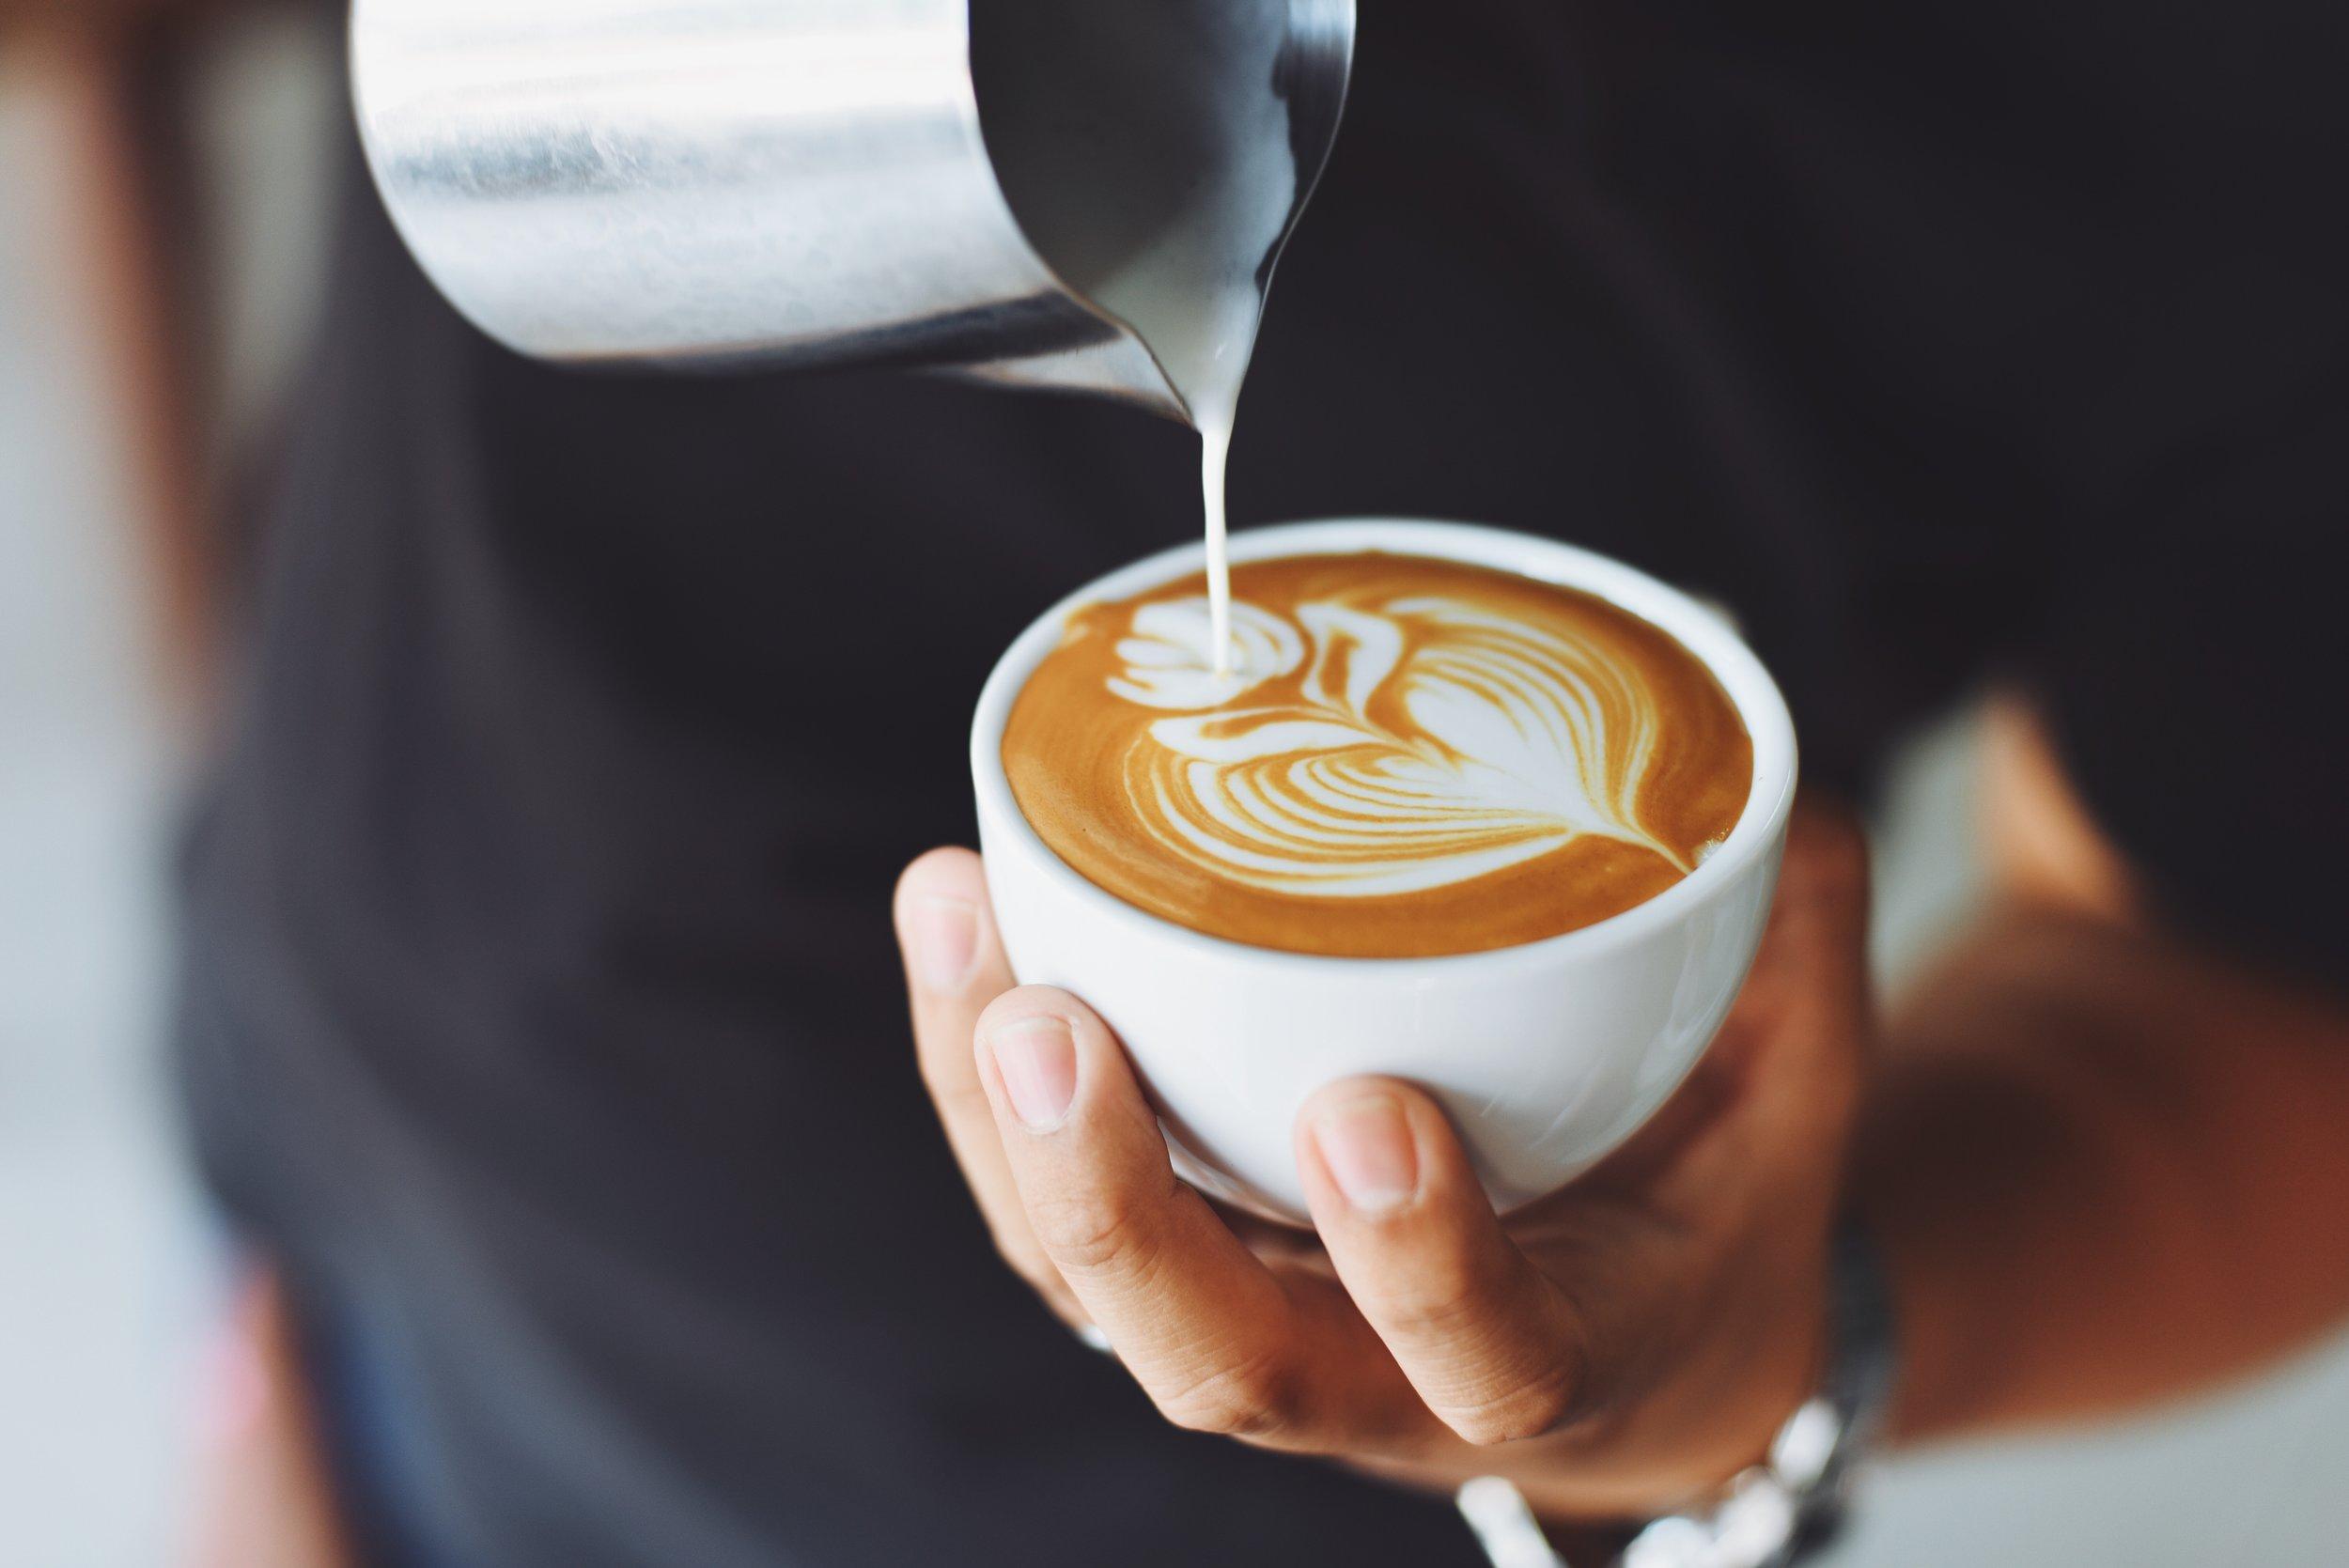 brighton girl coffee